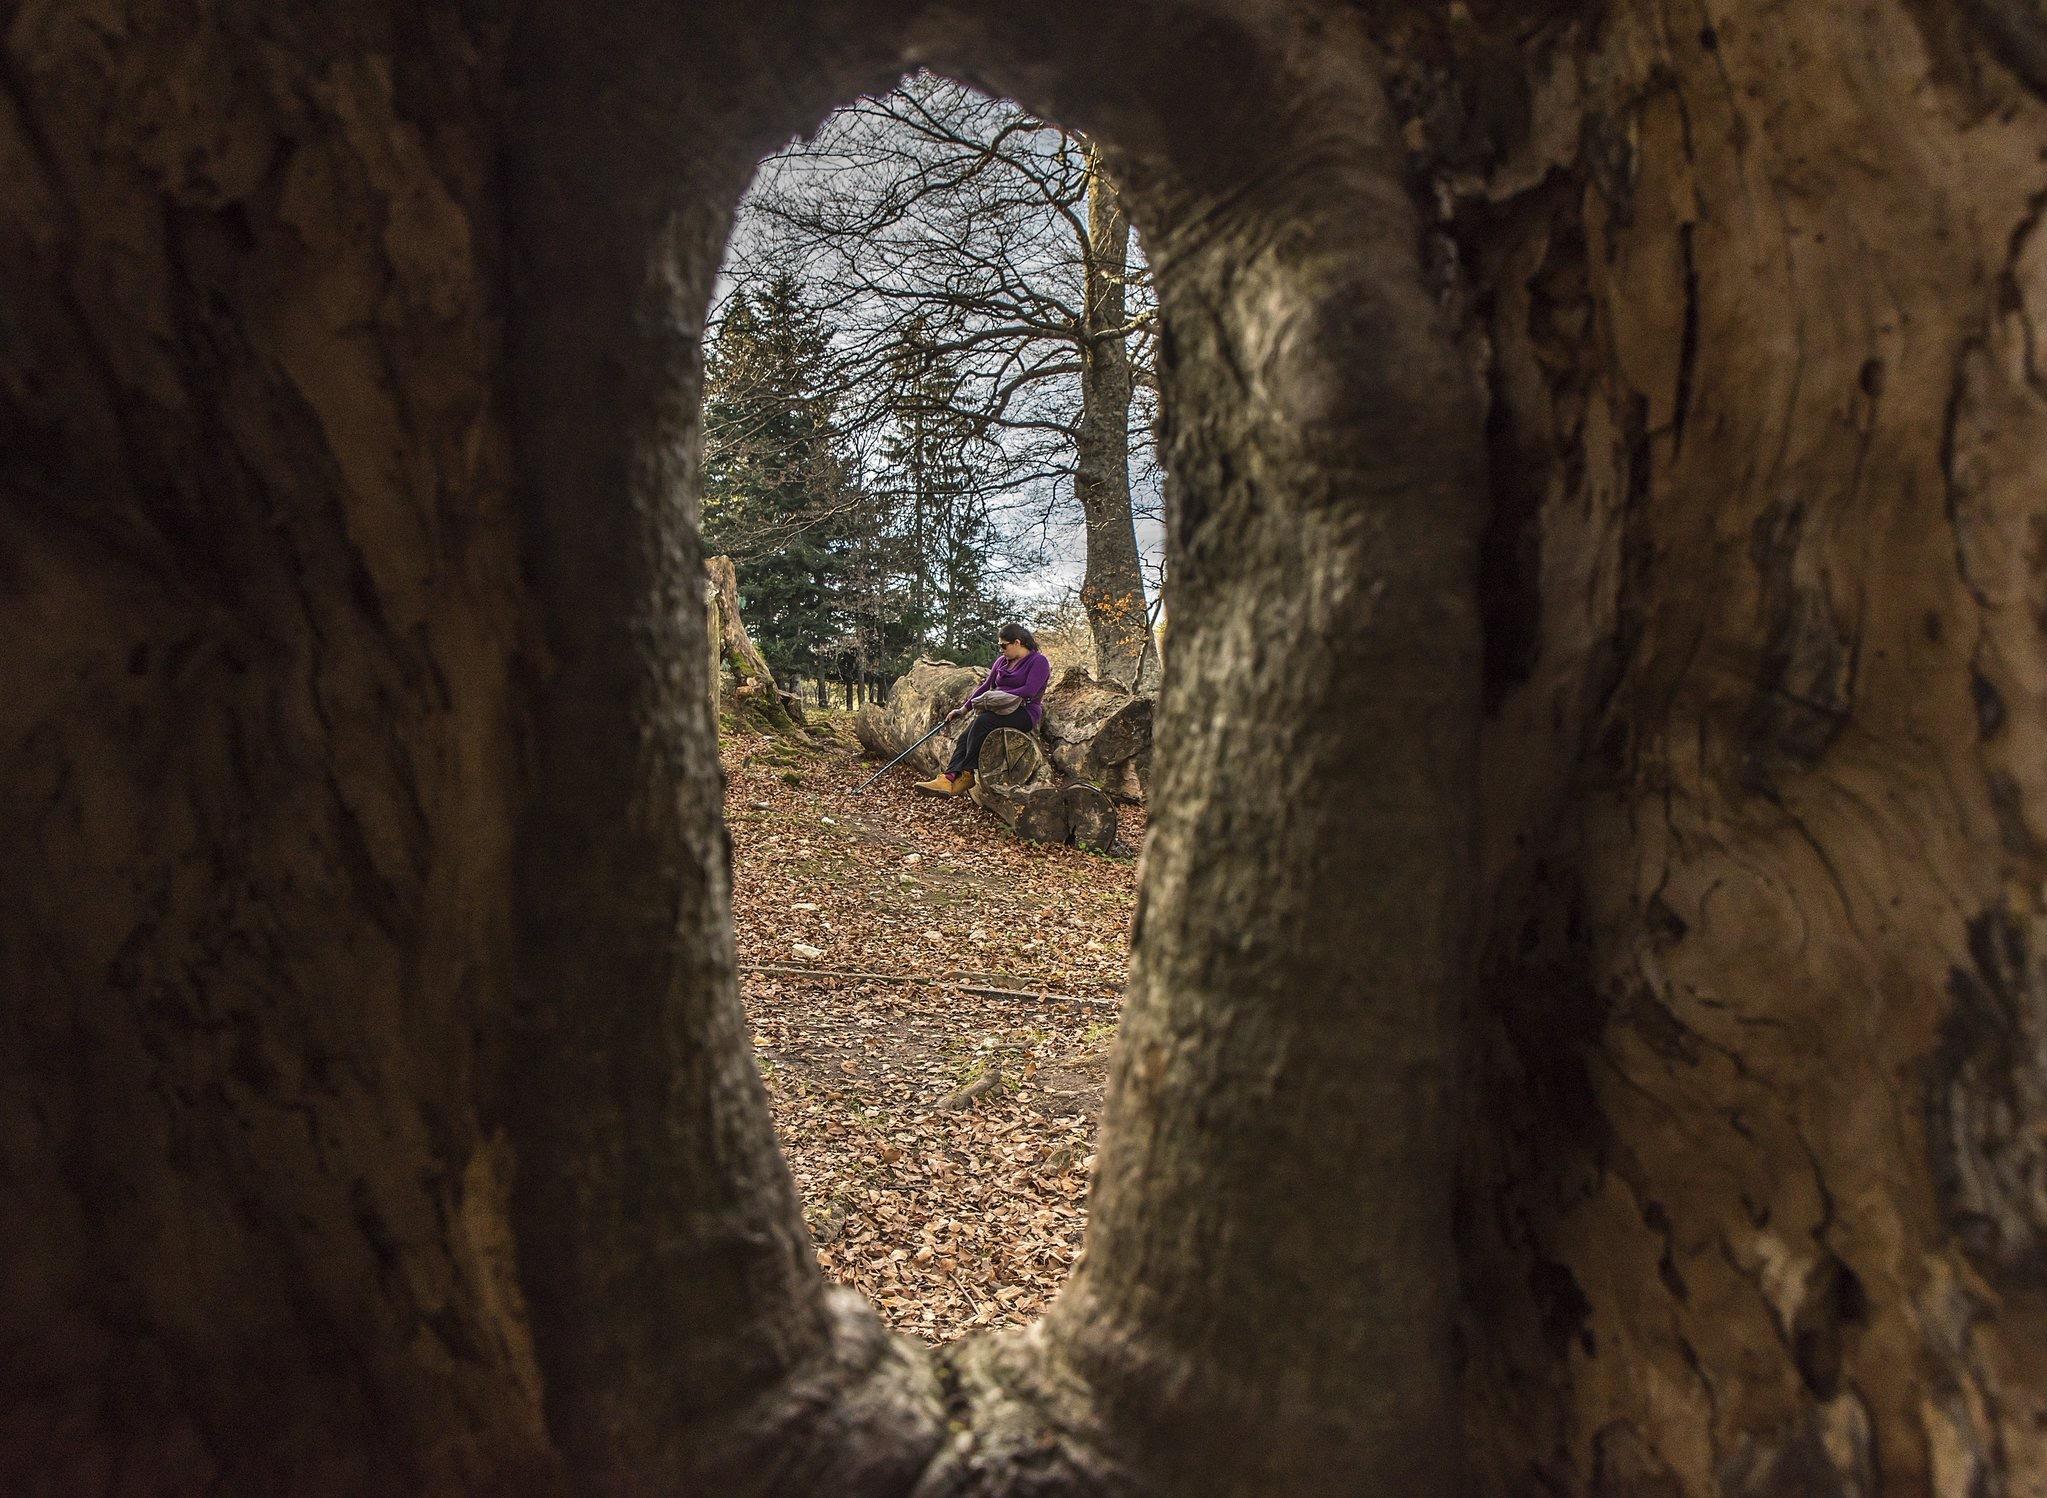 Trough the Tree by Alessio Rendimonti